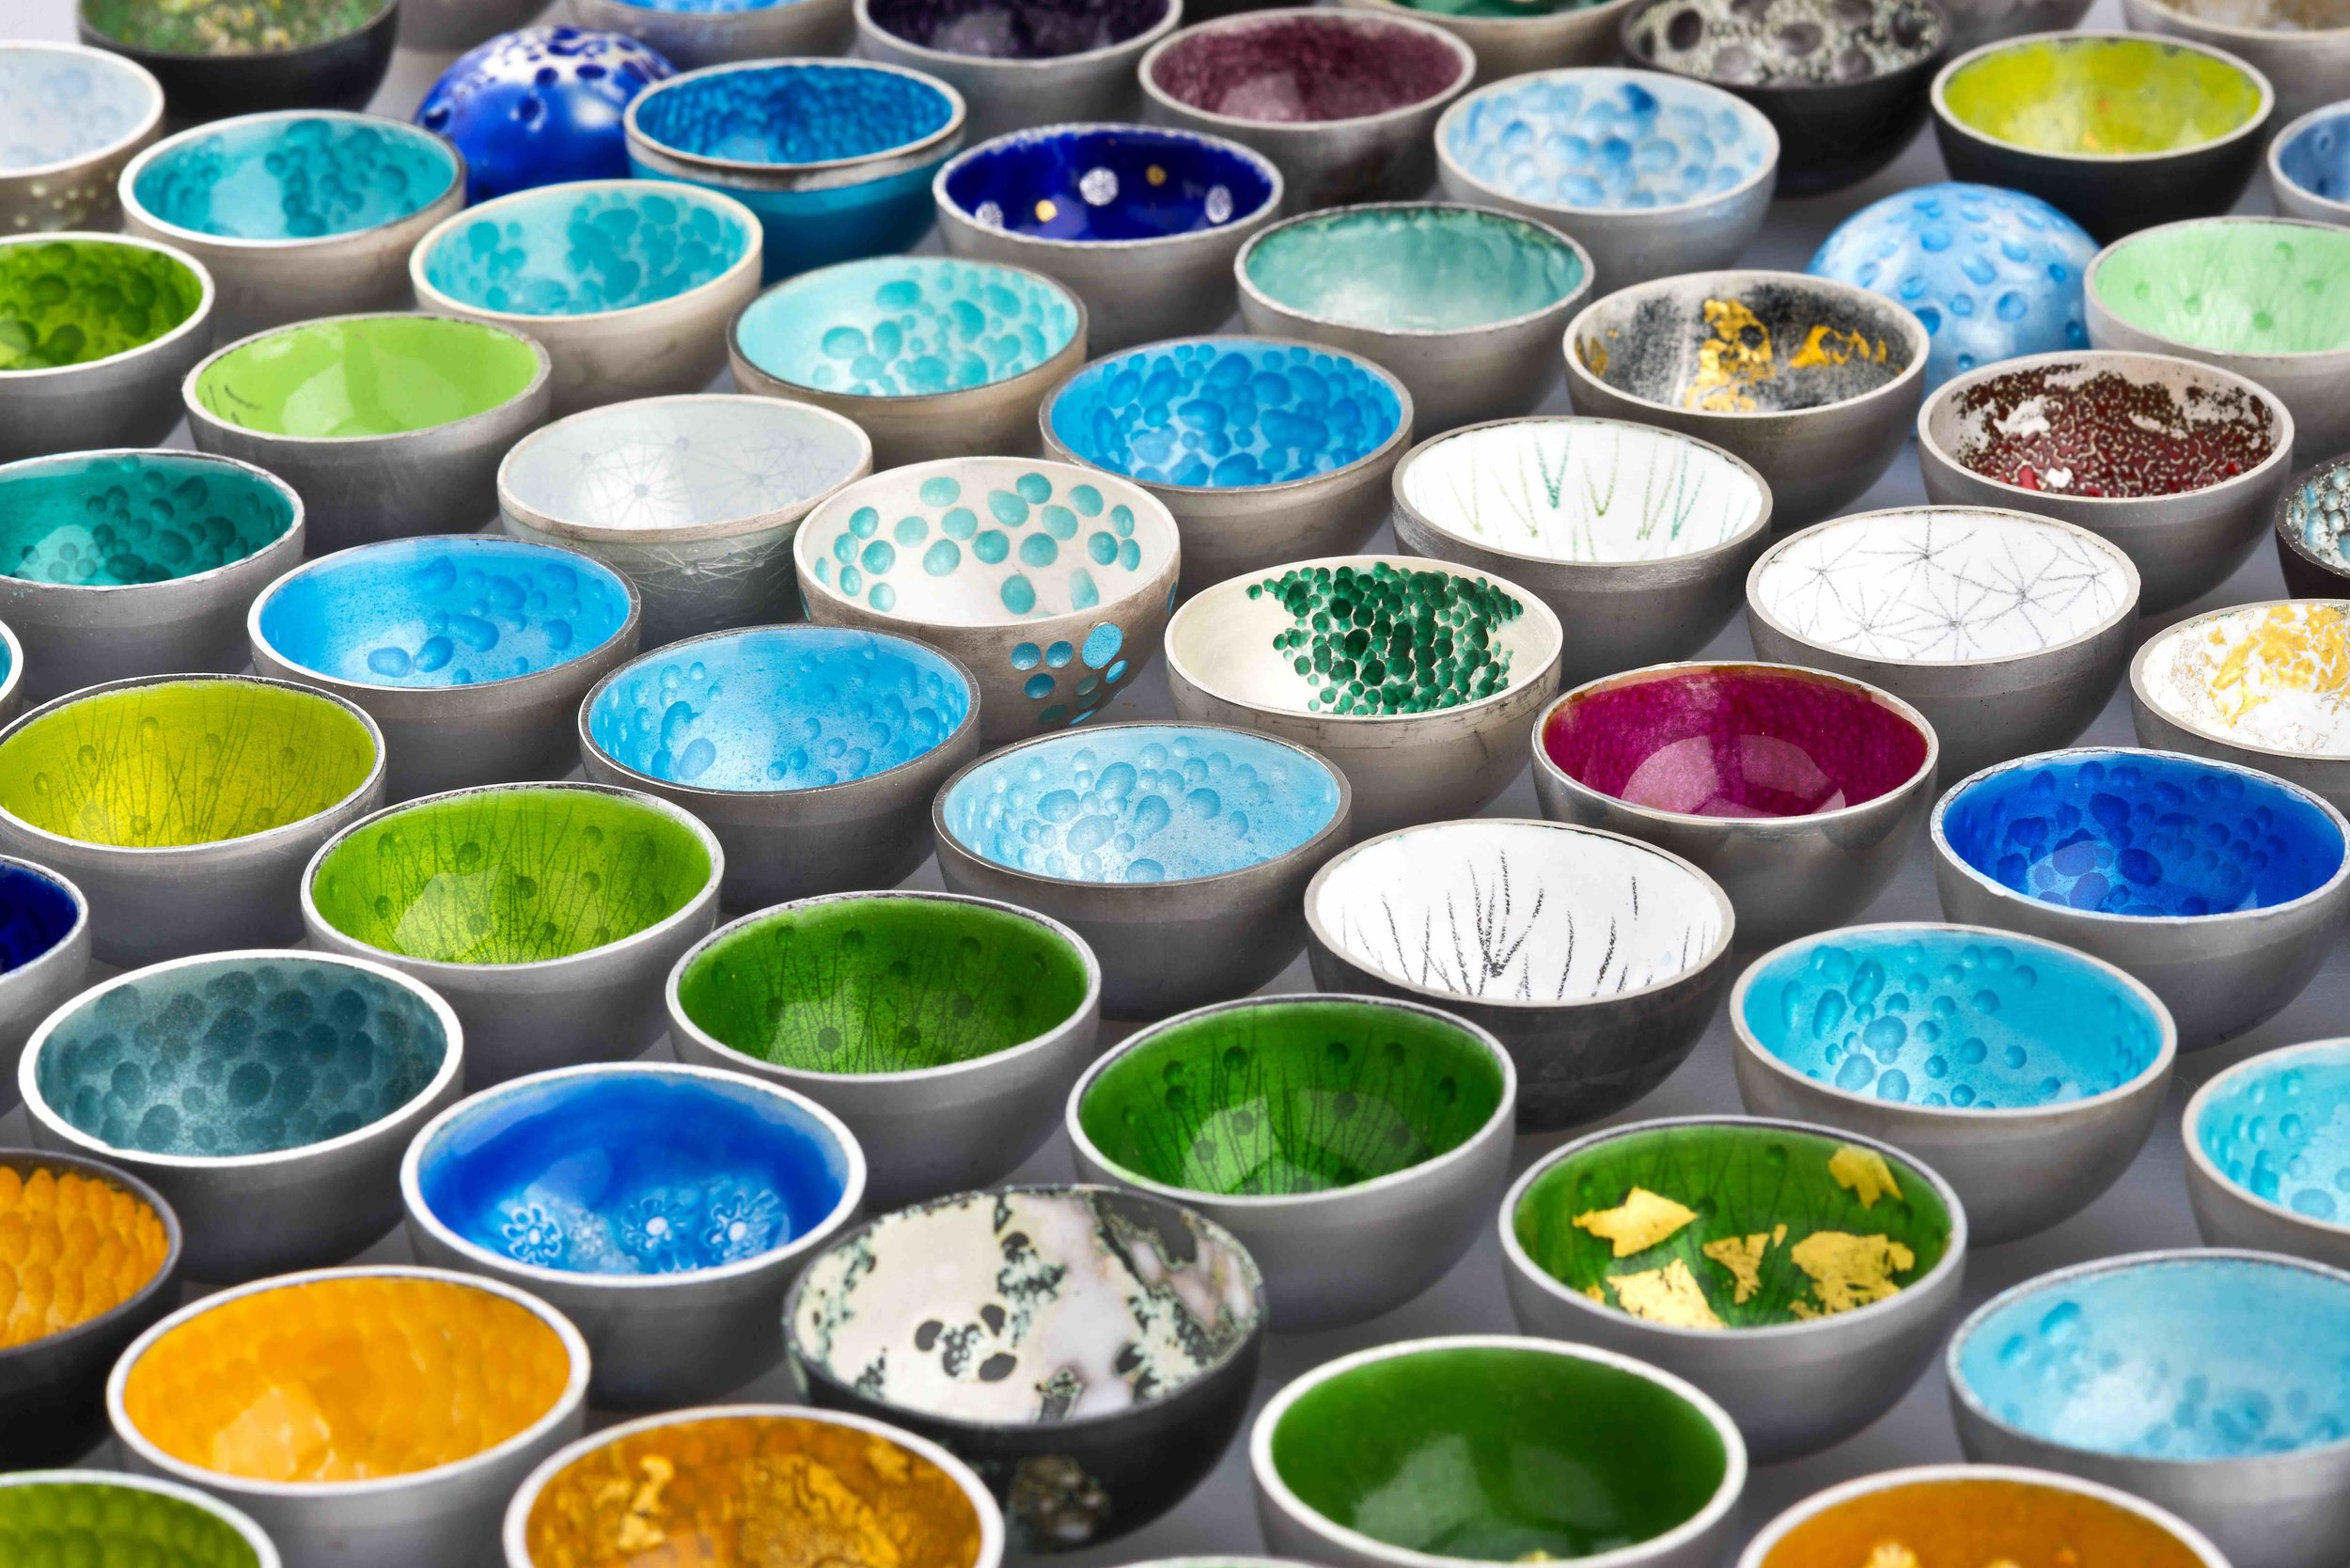 100_bowls_detail_3.jpg